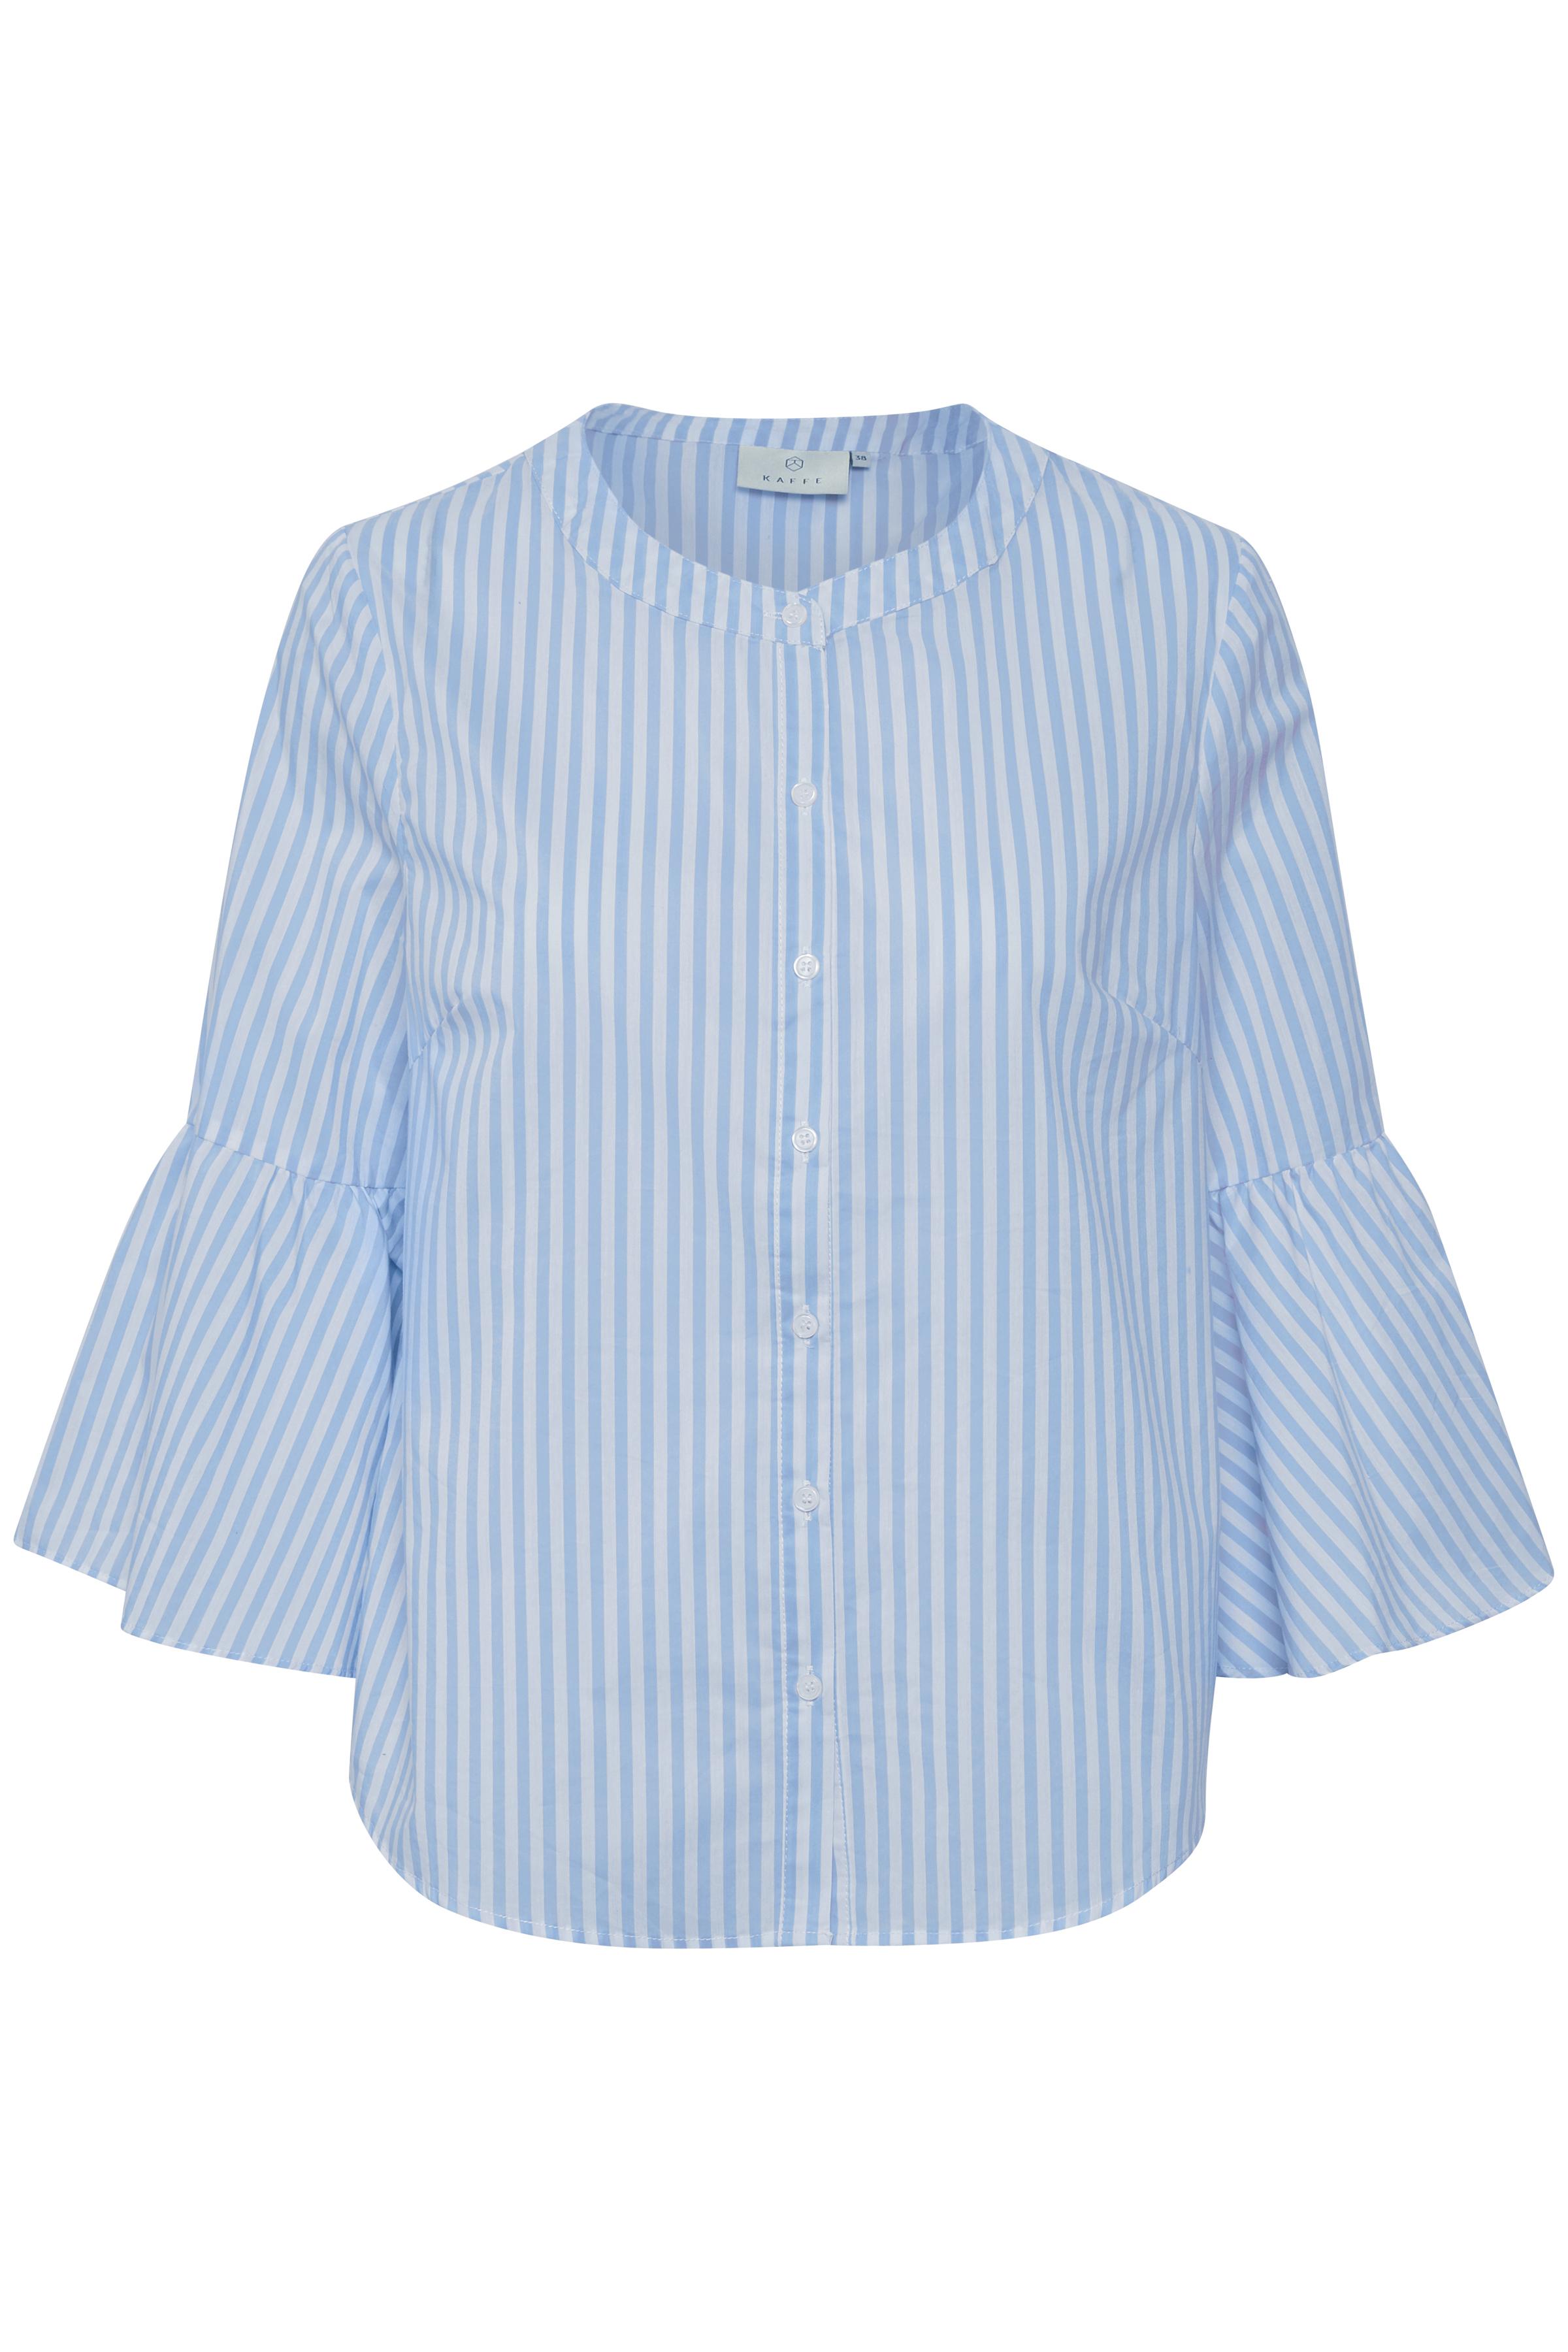 Kaffe blouse , dame, blue